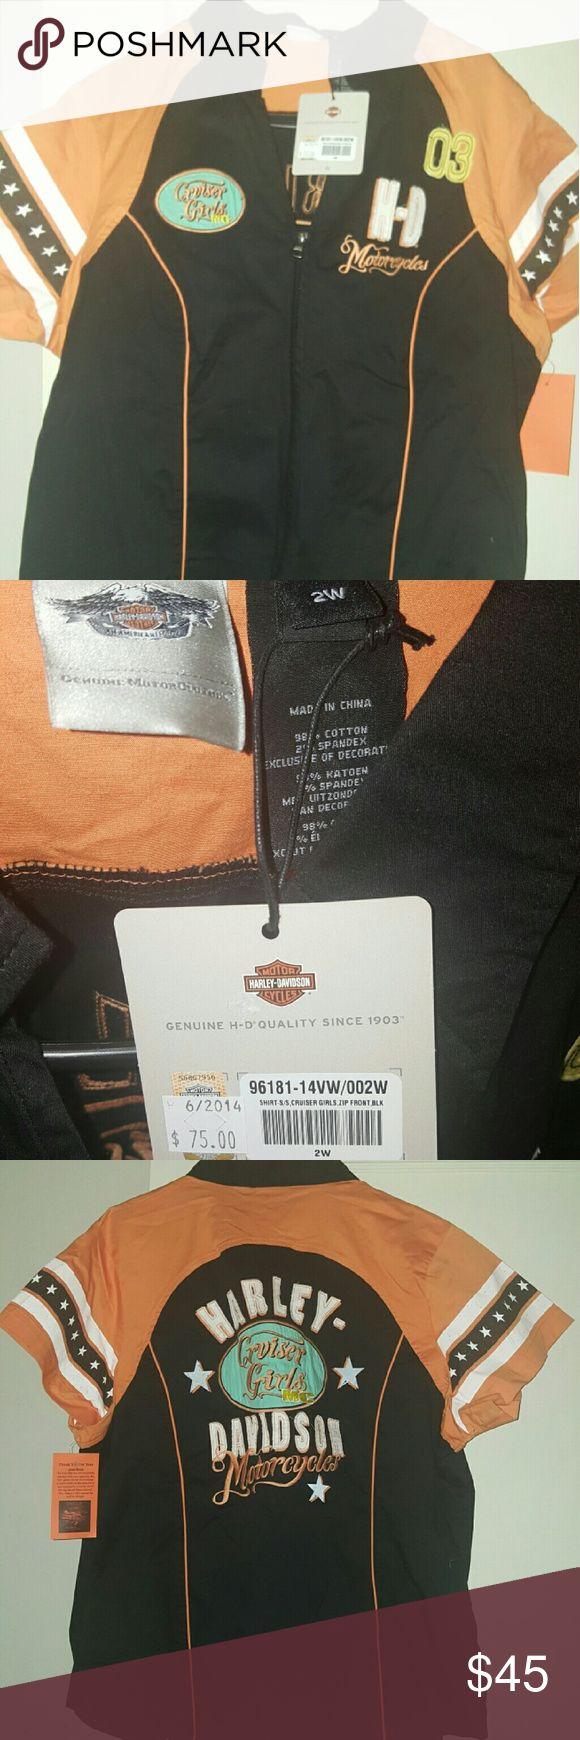 Harley-Davidson brand new zip up shirt Plus size, brand new with tags, Harley-Davidson zip up riding shirt! Size 2w (Harley's 2x women) Harley-Davidson Tops